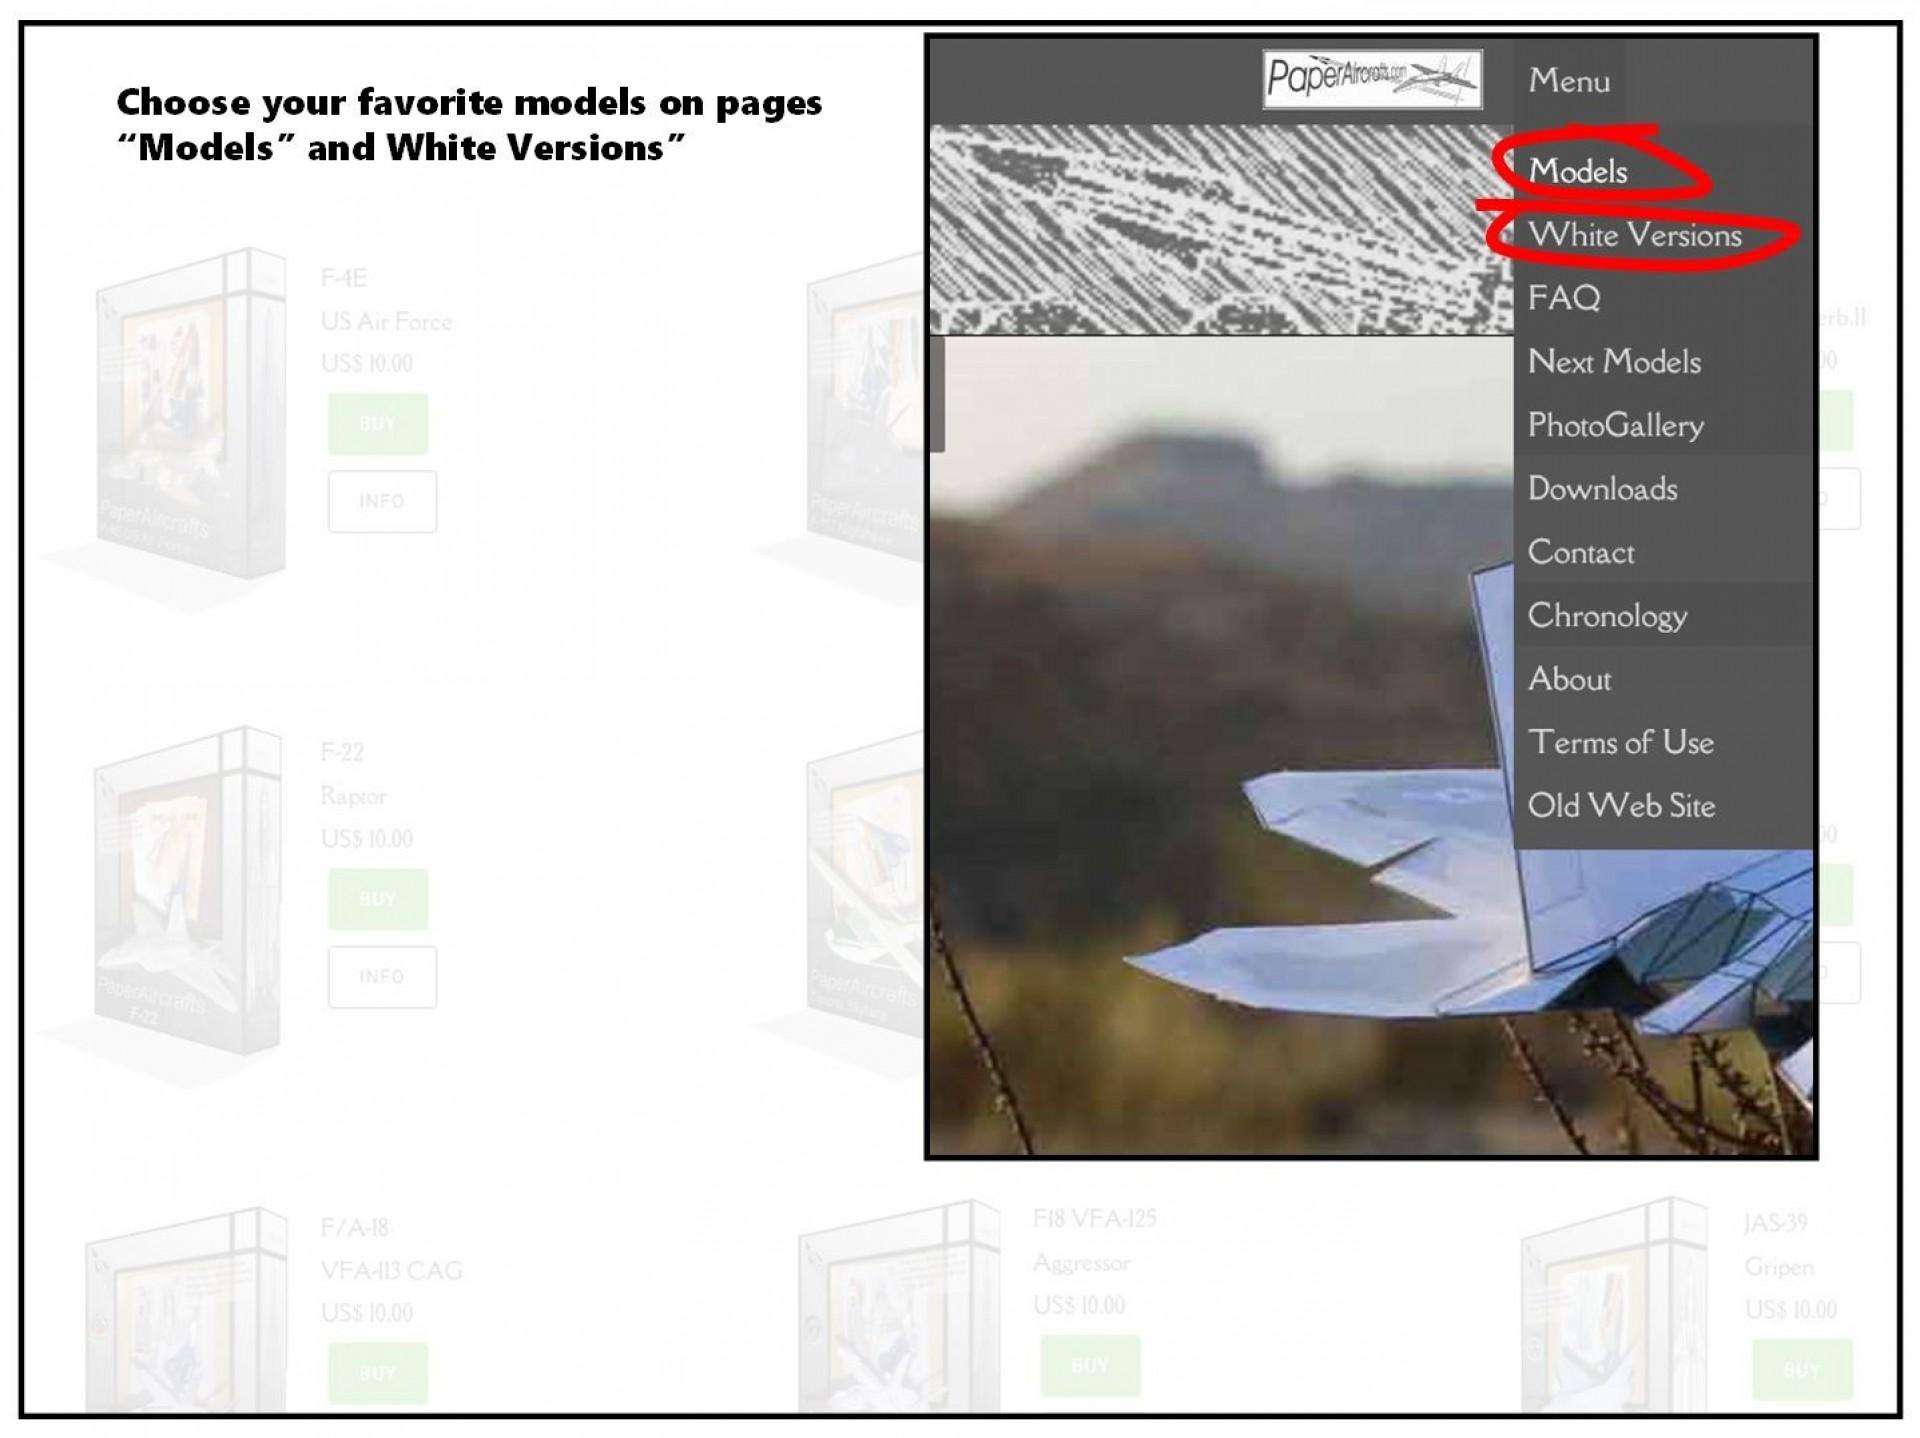 006 Awful Free Paper Airplane Design Printable Template Highest Quality  Designs-printable Templates1920